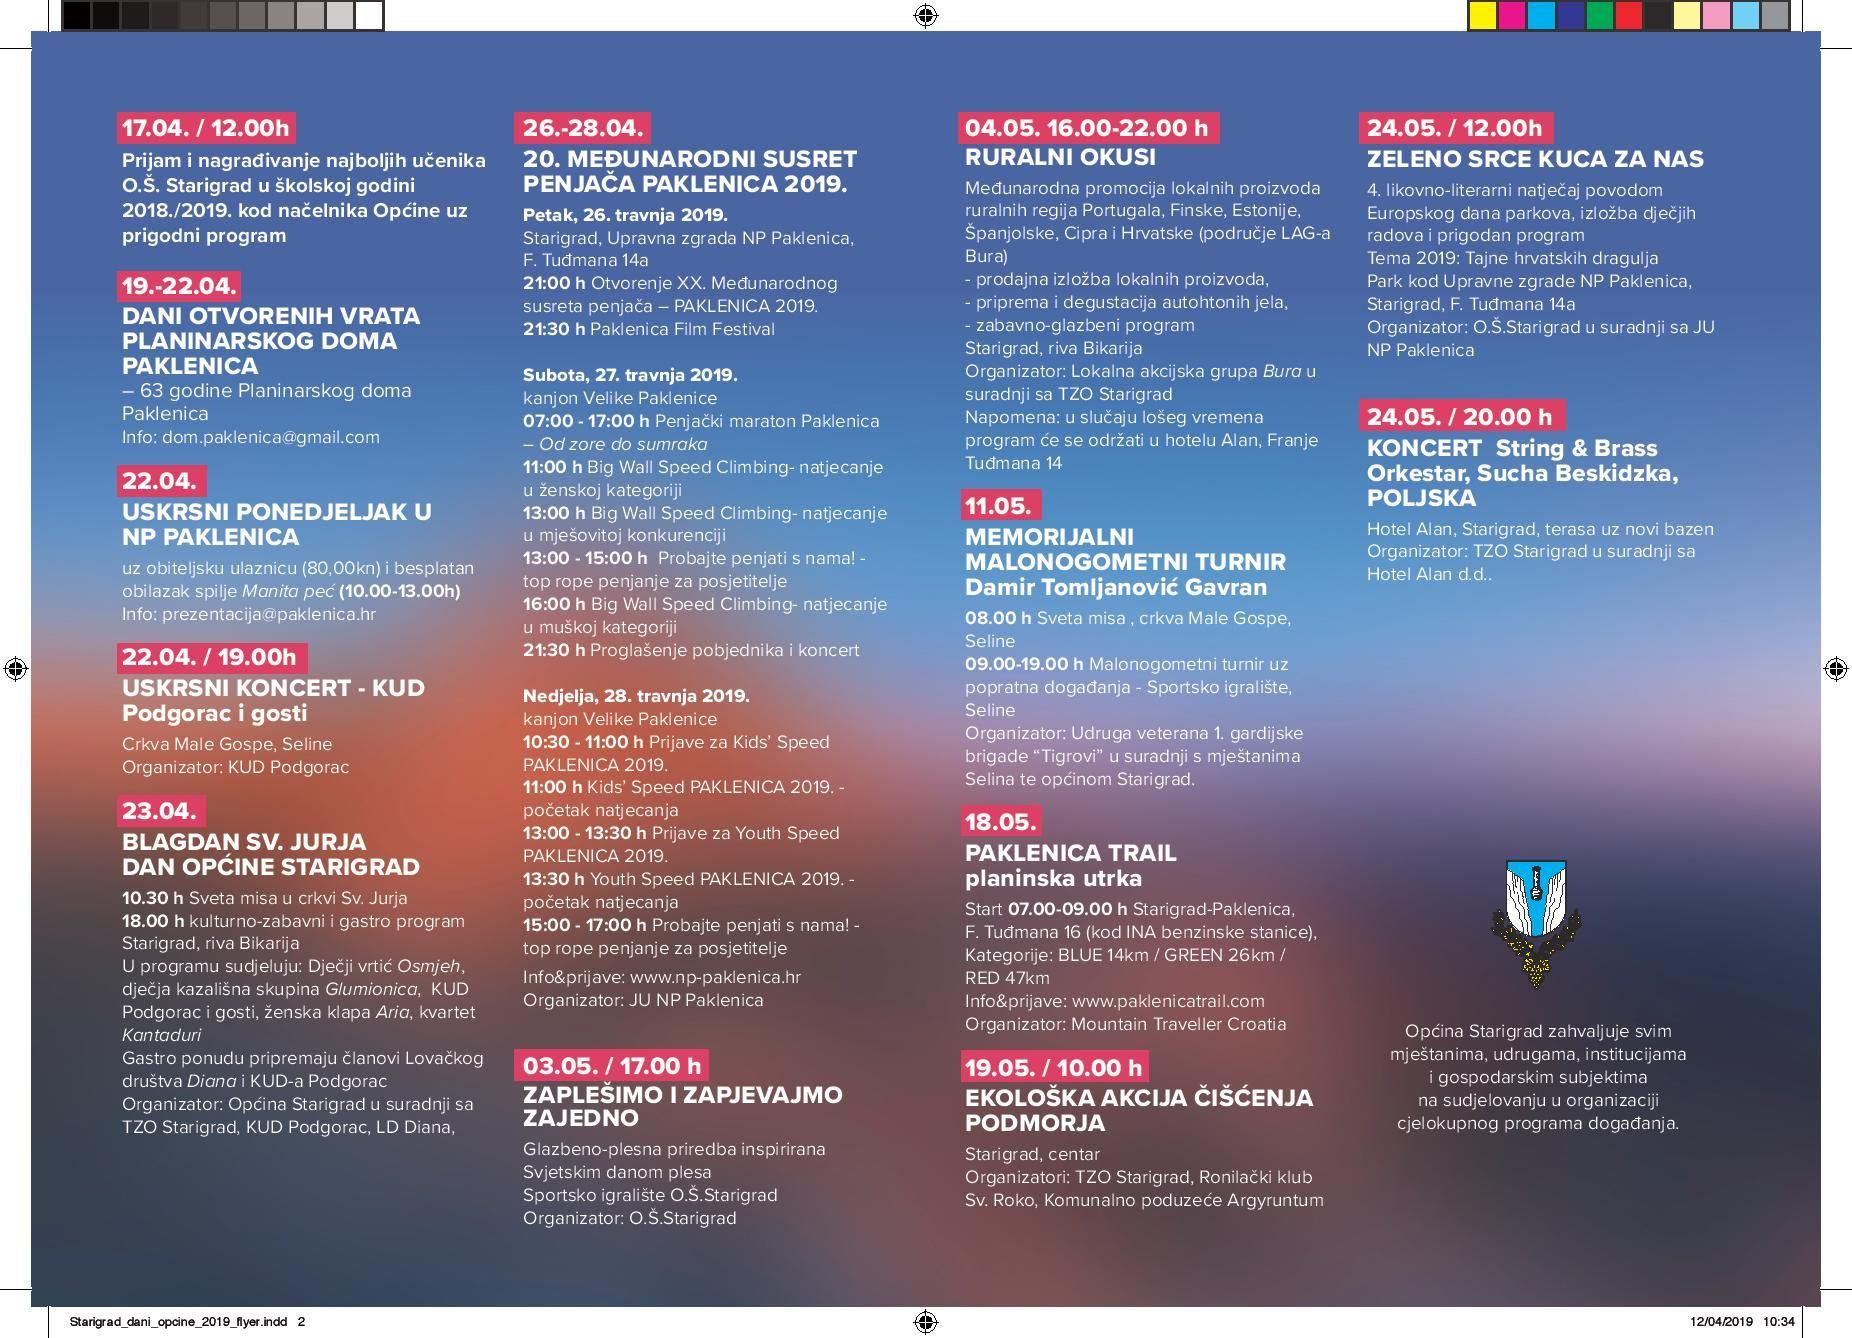 Starigrad_dani_opcine_2019_flyer-page-002